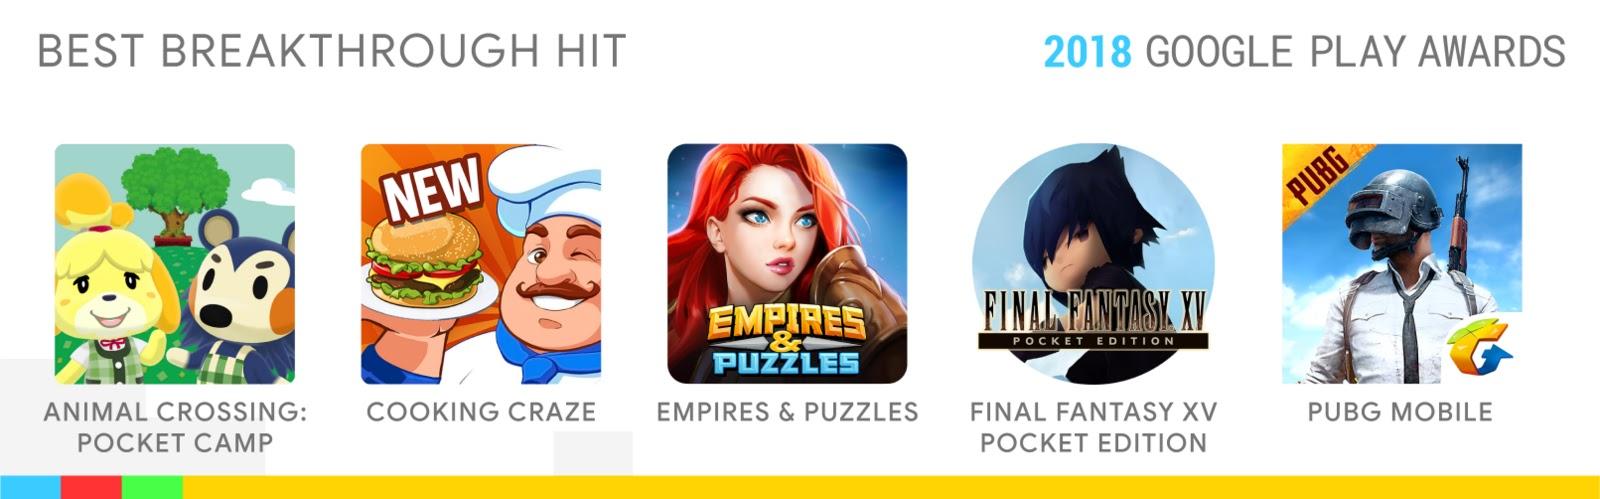 Best Breakthrough Hit: Animal Crossing: Pocket Camp, Cooking Craze, Empires & Puzzles, Final Fantasy XV Pocket Edition, PUBG MOBILE